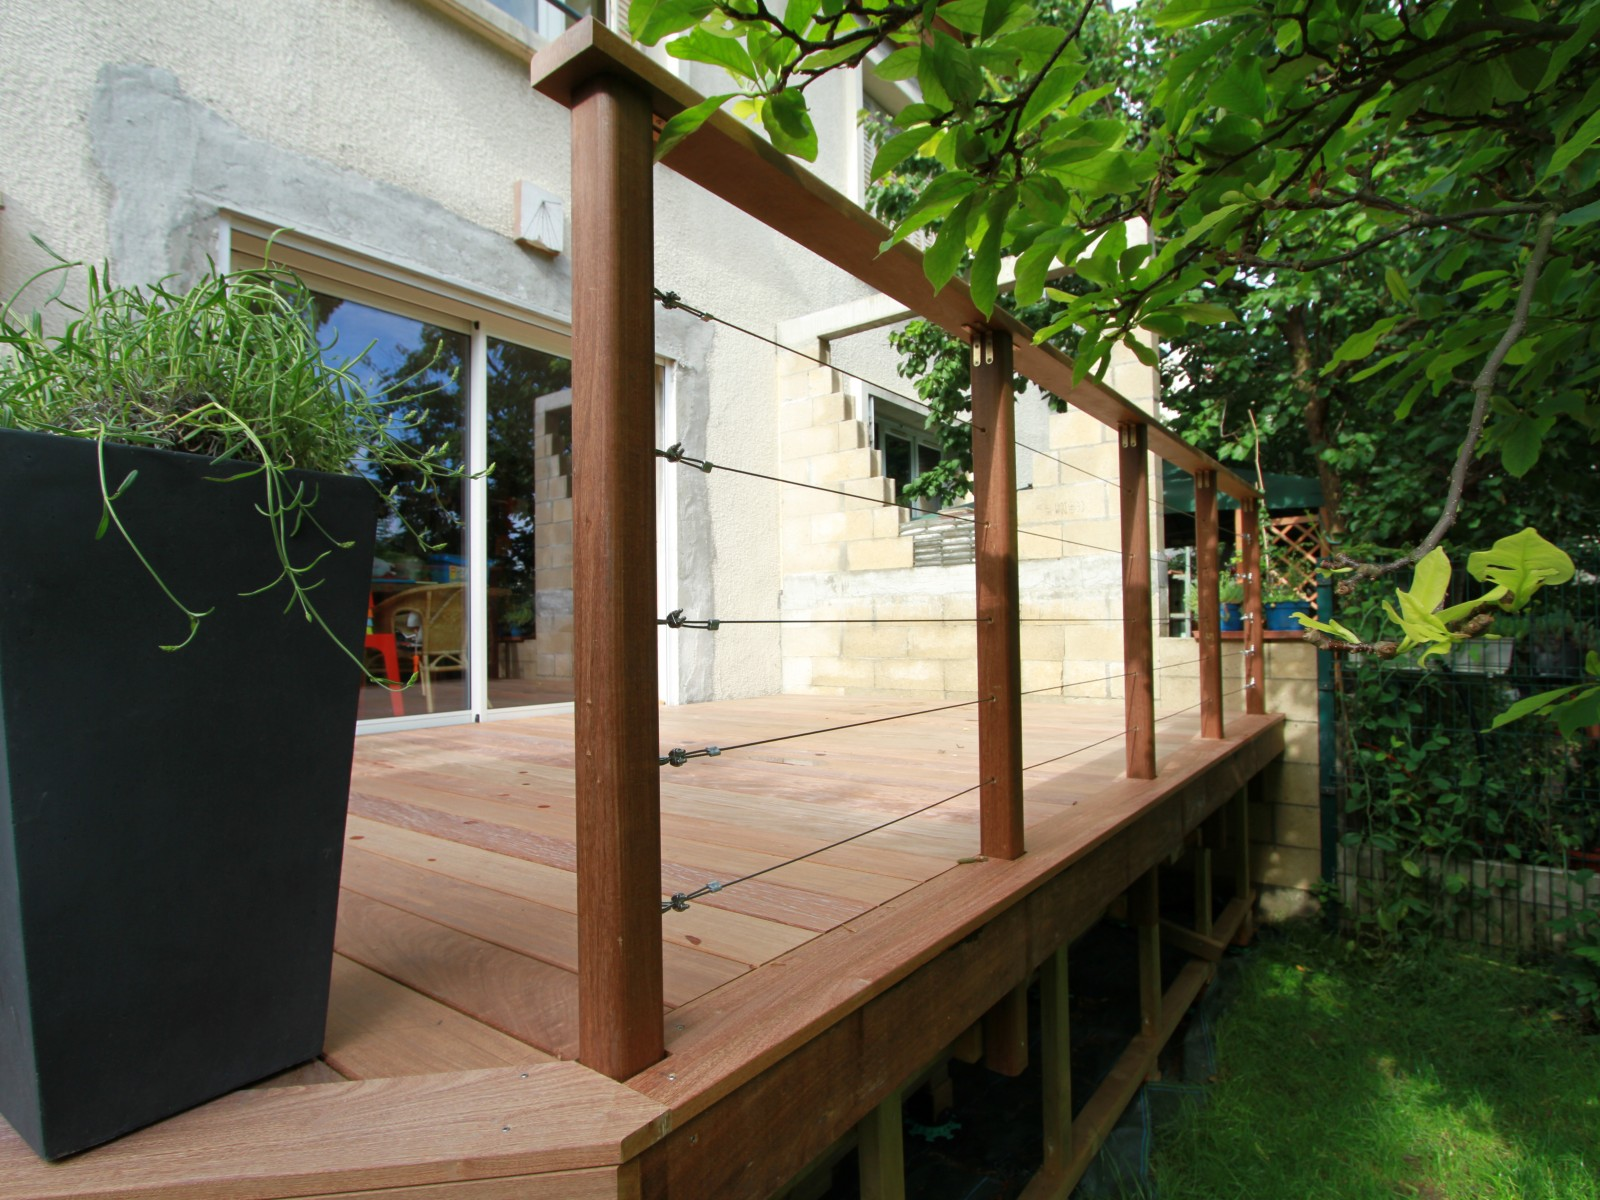 sur ma terrasse terrasse sur lev e et son garde corps. Black Bedroom Furniture Sets. Home Design Ideas